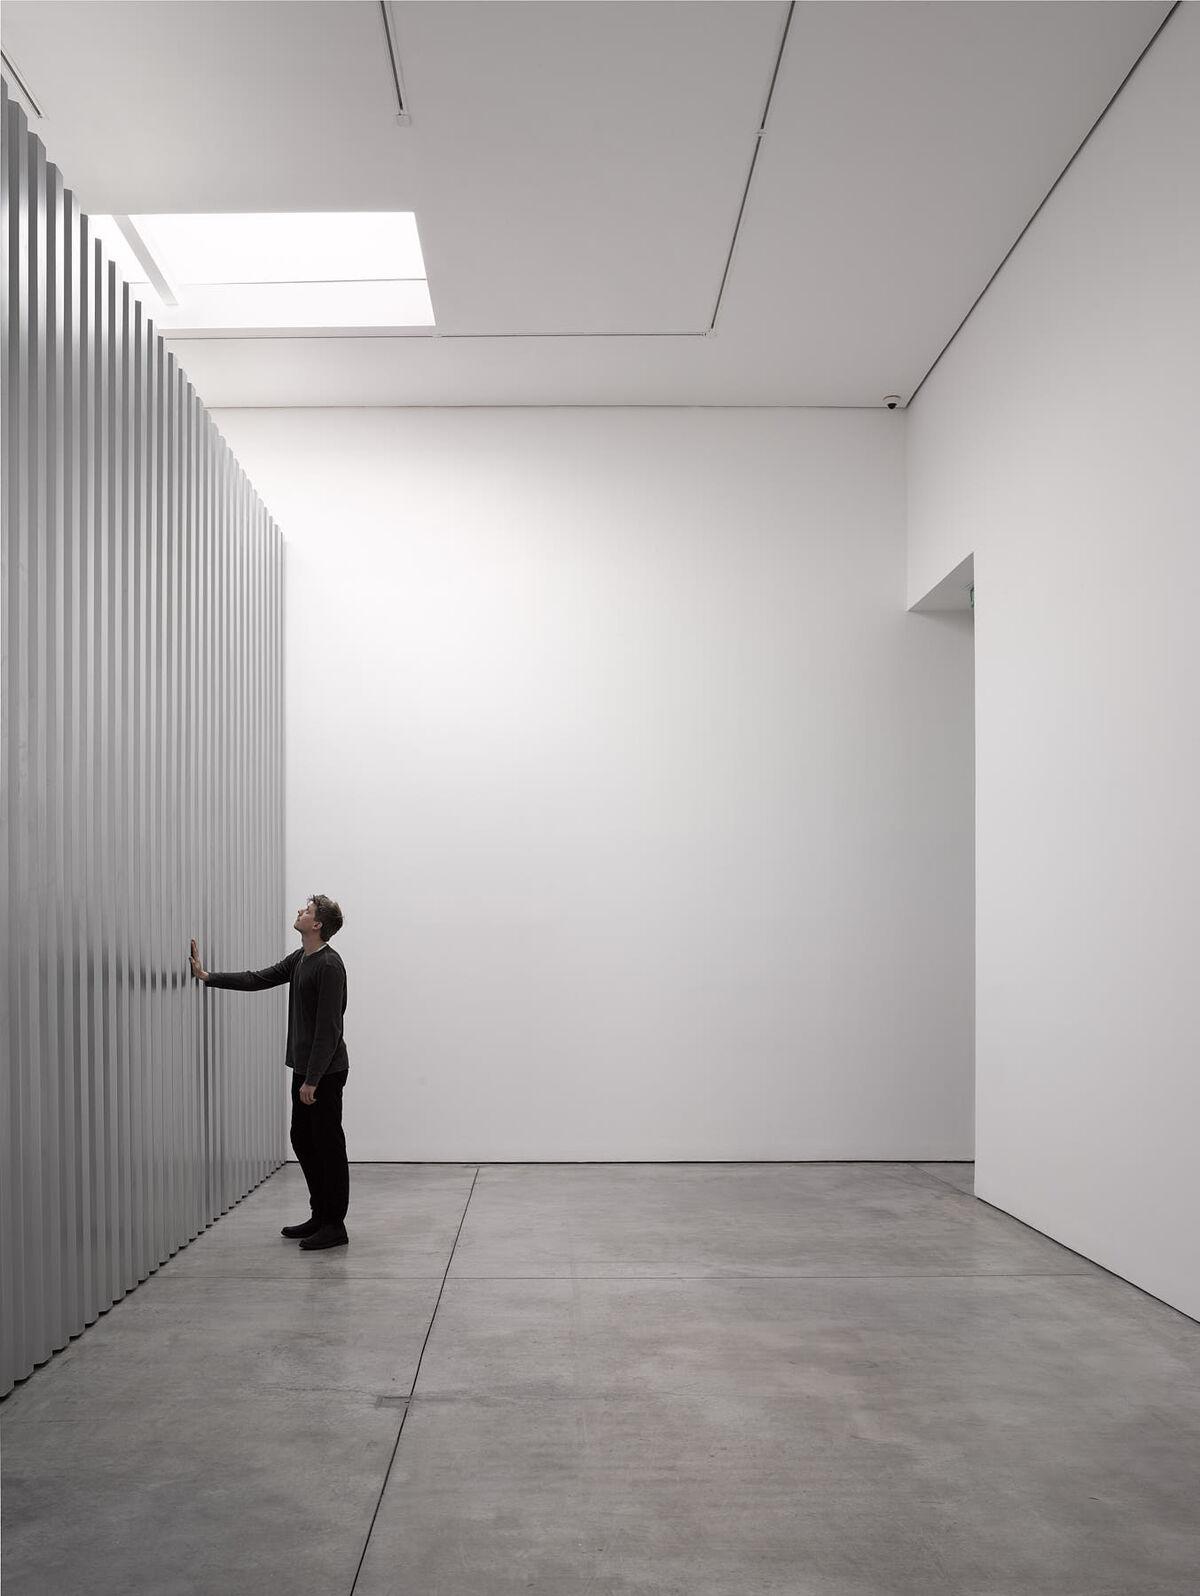 Installation view of Miroslaw Balka, Random Access Memory, at White Cube's Mason's Yard, 2019. © Miroslaw Balka. Courtesy of White Cube and Theo Christelis.